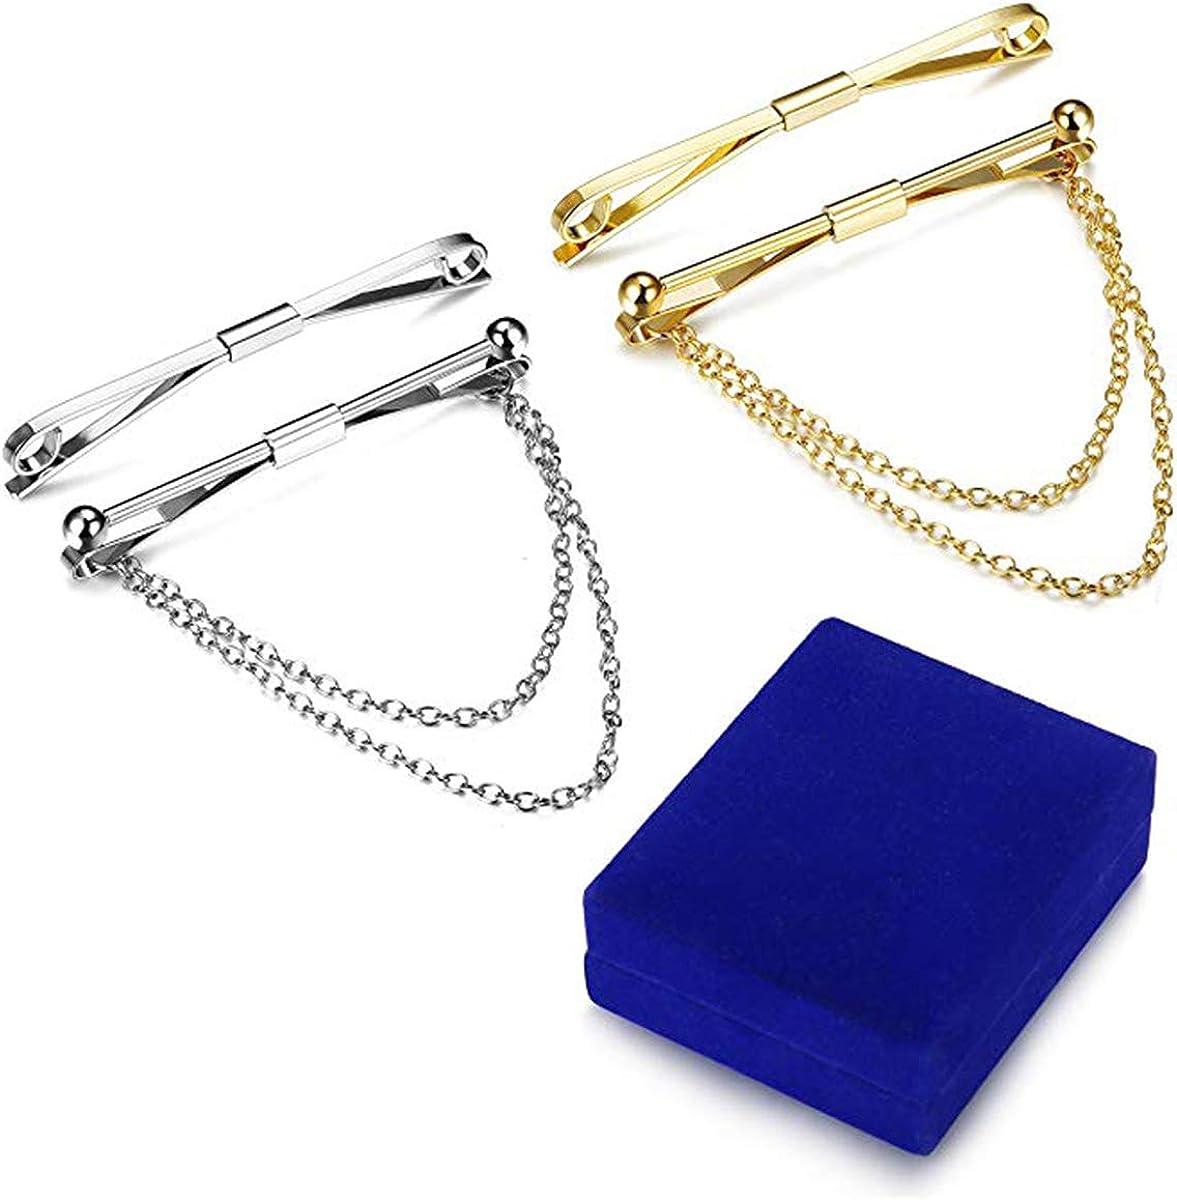 argent col Set de Krawattennadel col aiguille col Bar Collar broches piercingj 3/x Stylet Homme col broches avec cha/îne